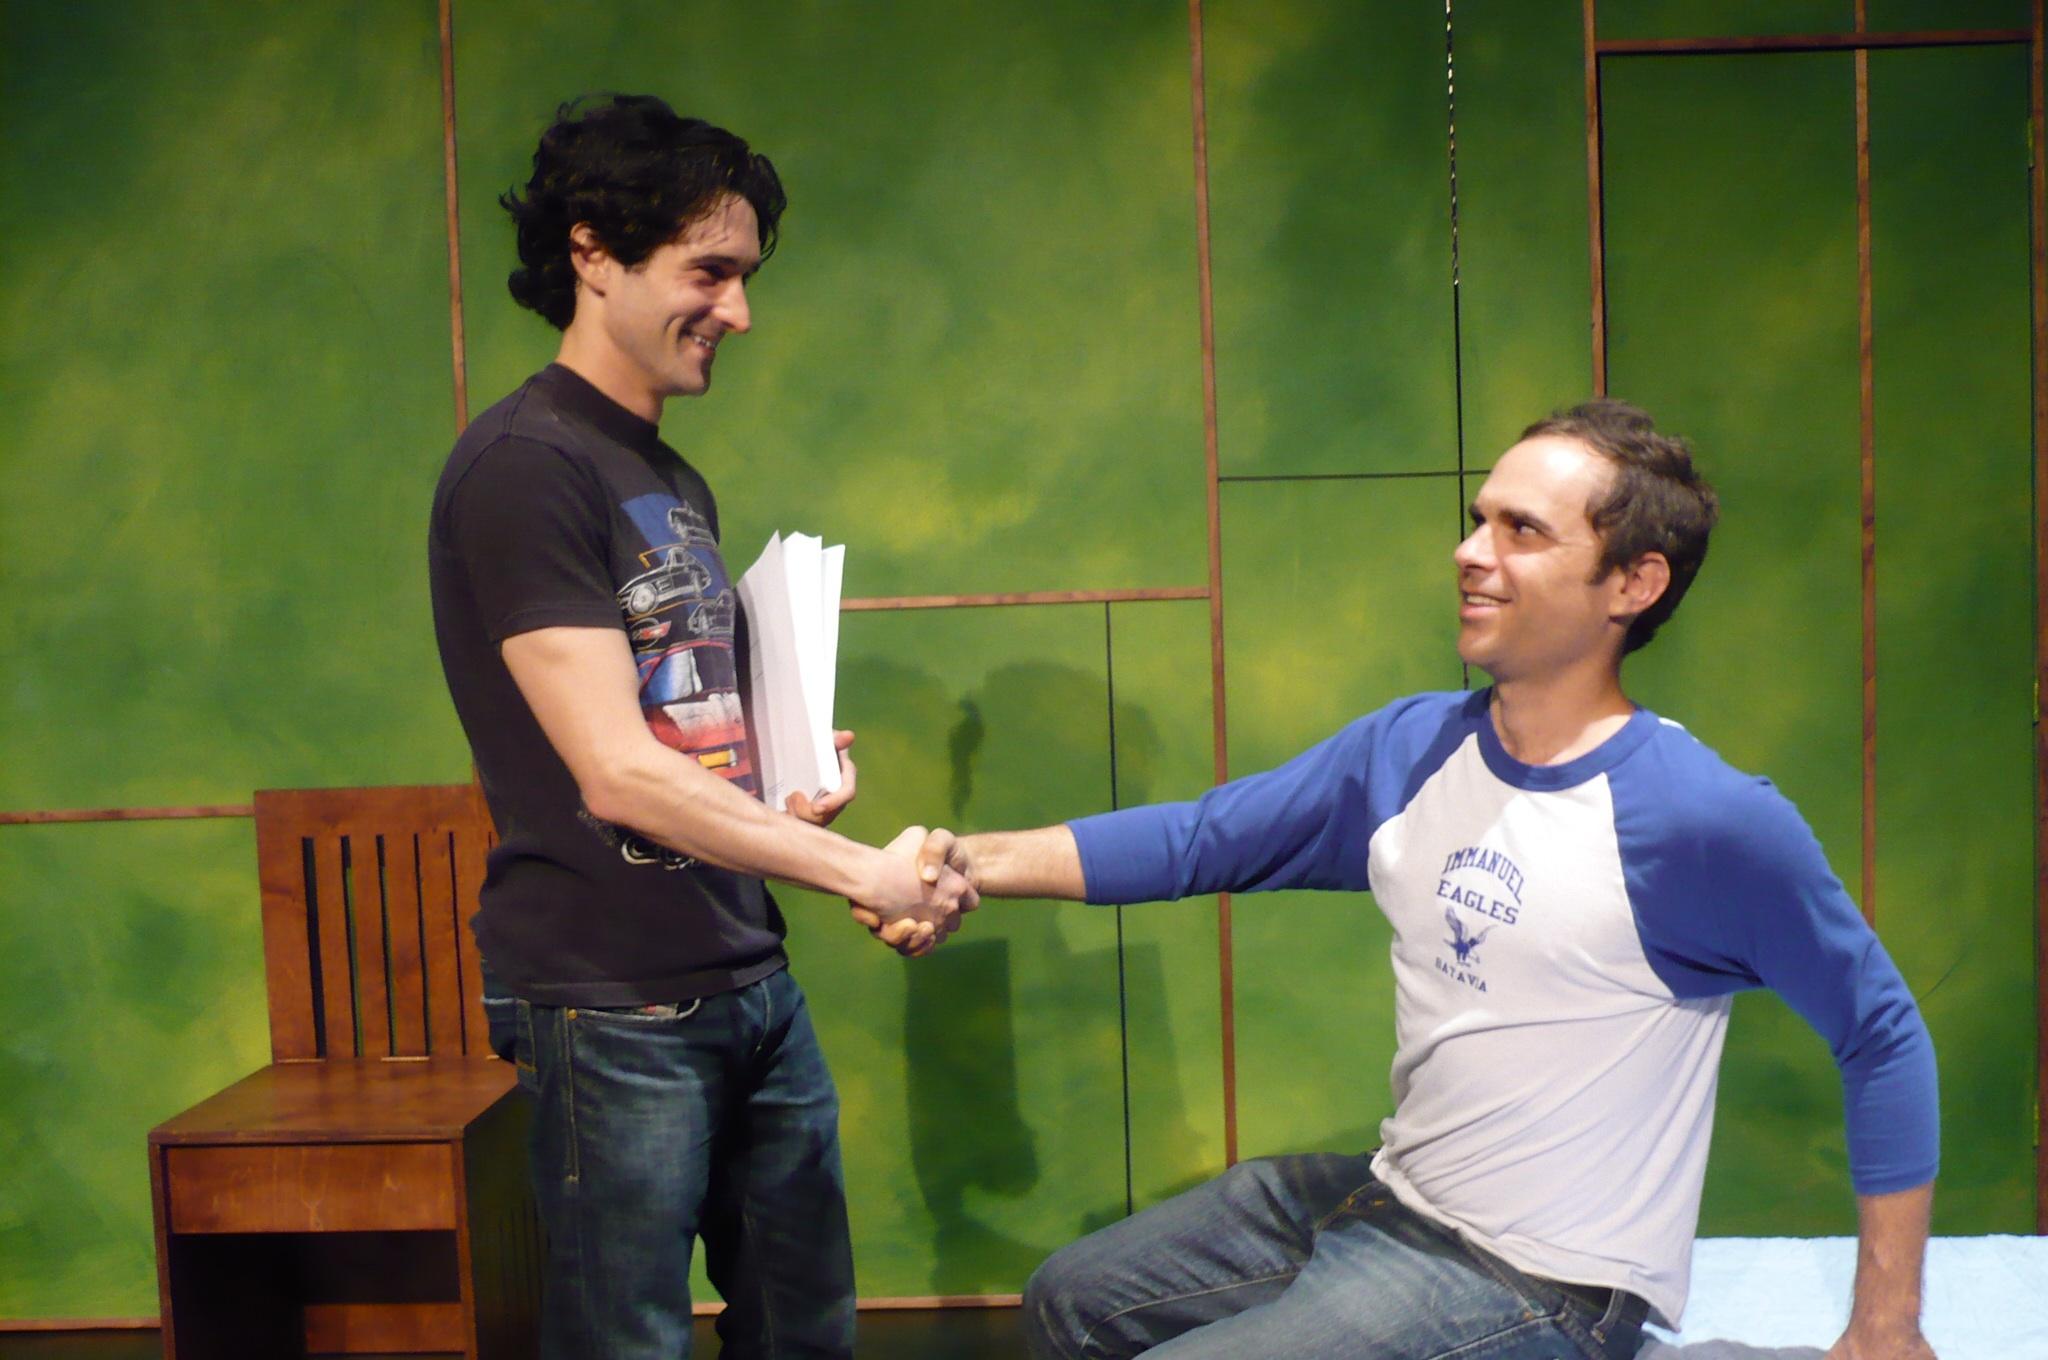 Steven Klein & Ryan Johnston